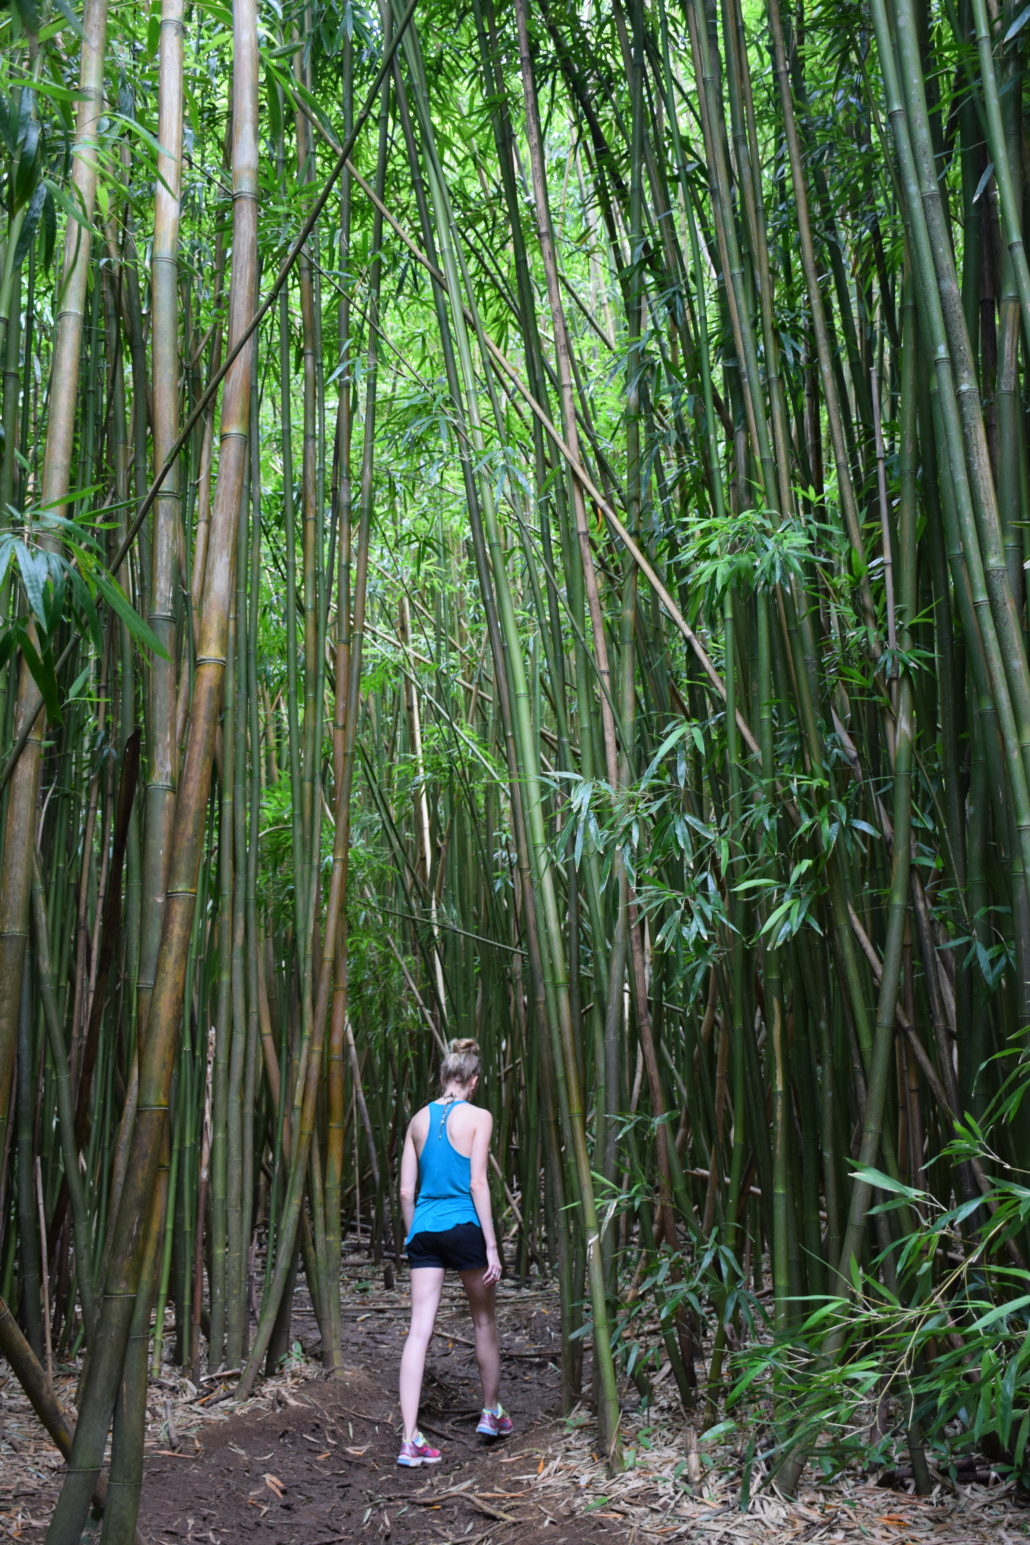 Bamboo Falls hike on the Road to Hana